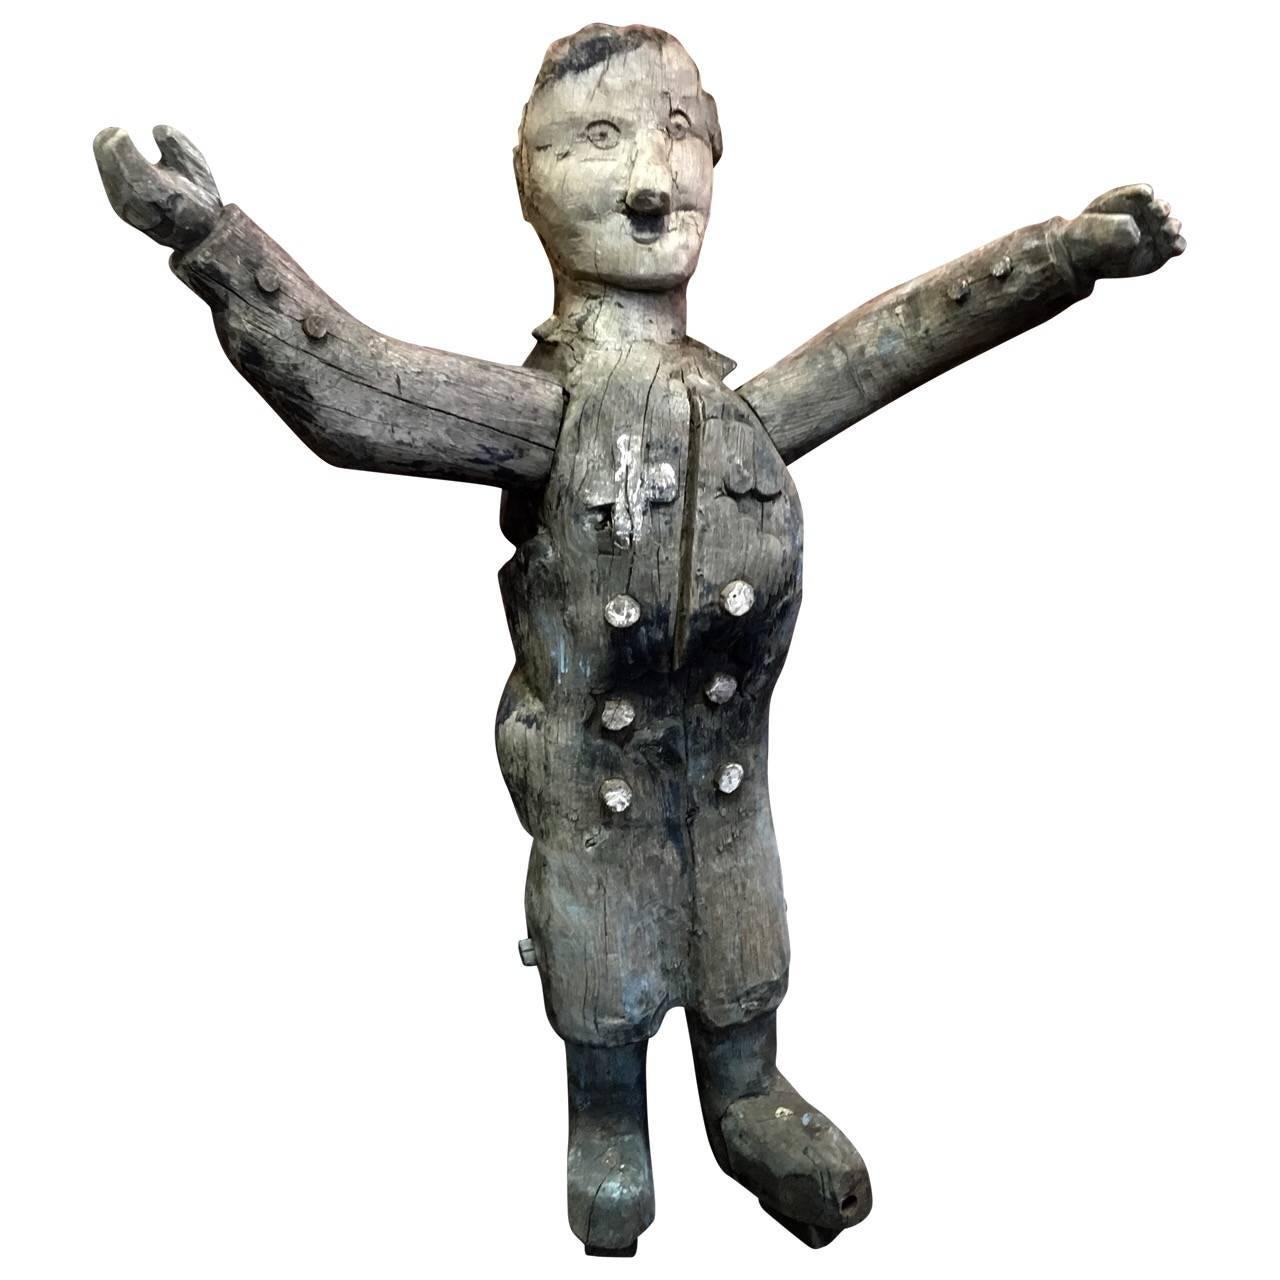 Satirical Hitler Figure from 2nd World War Occupied Denmark